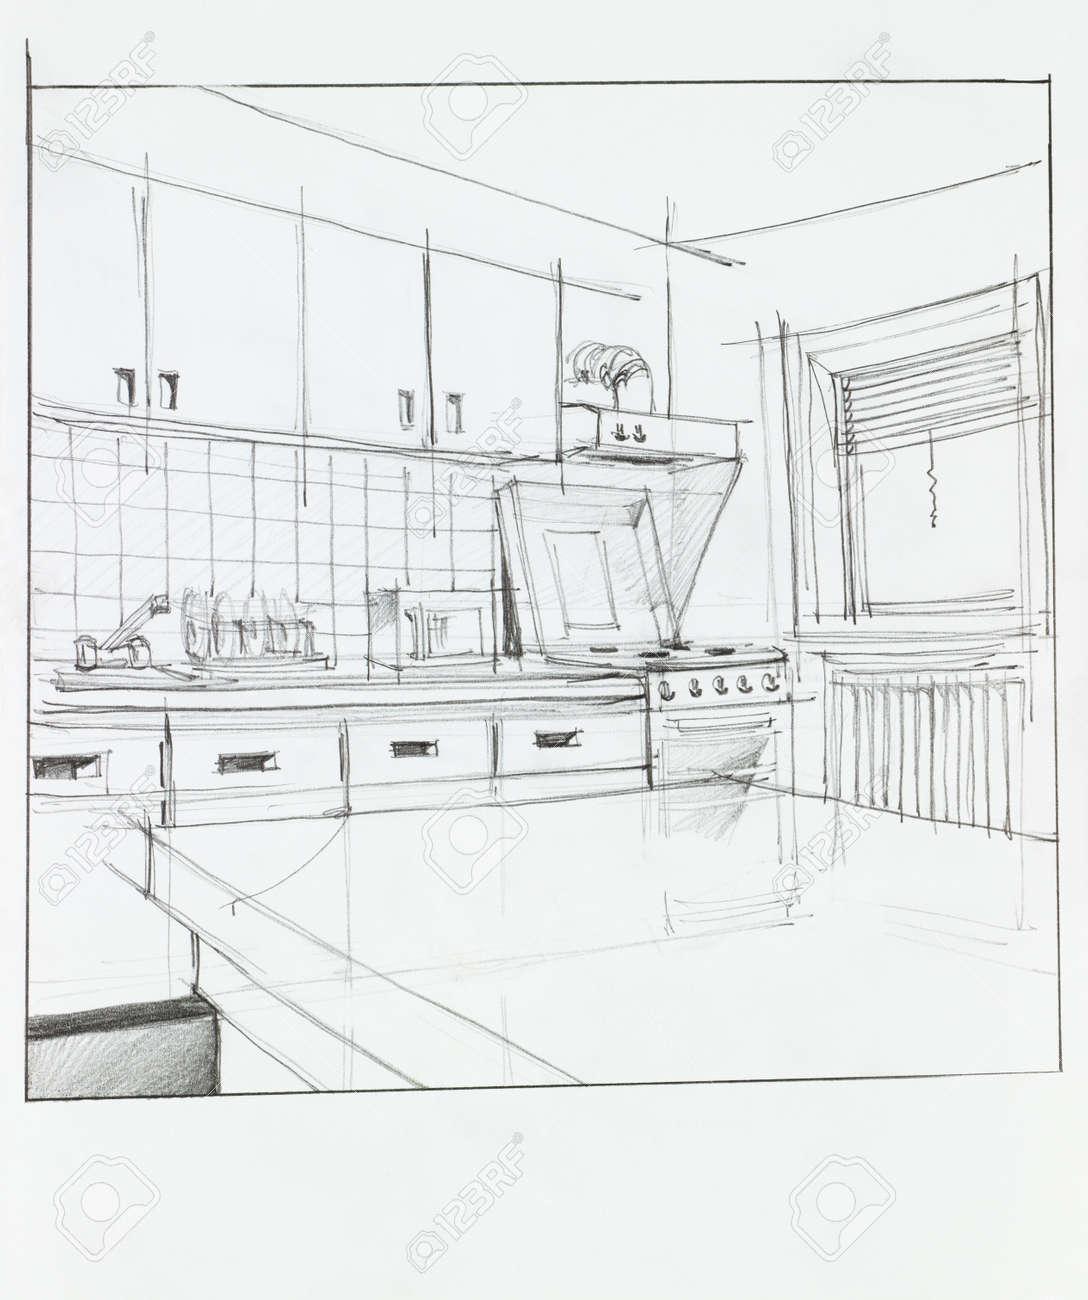 Stunning Disegnare Una Cucina Photos - bakeroffroad.us ...